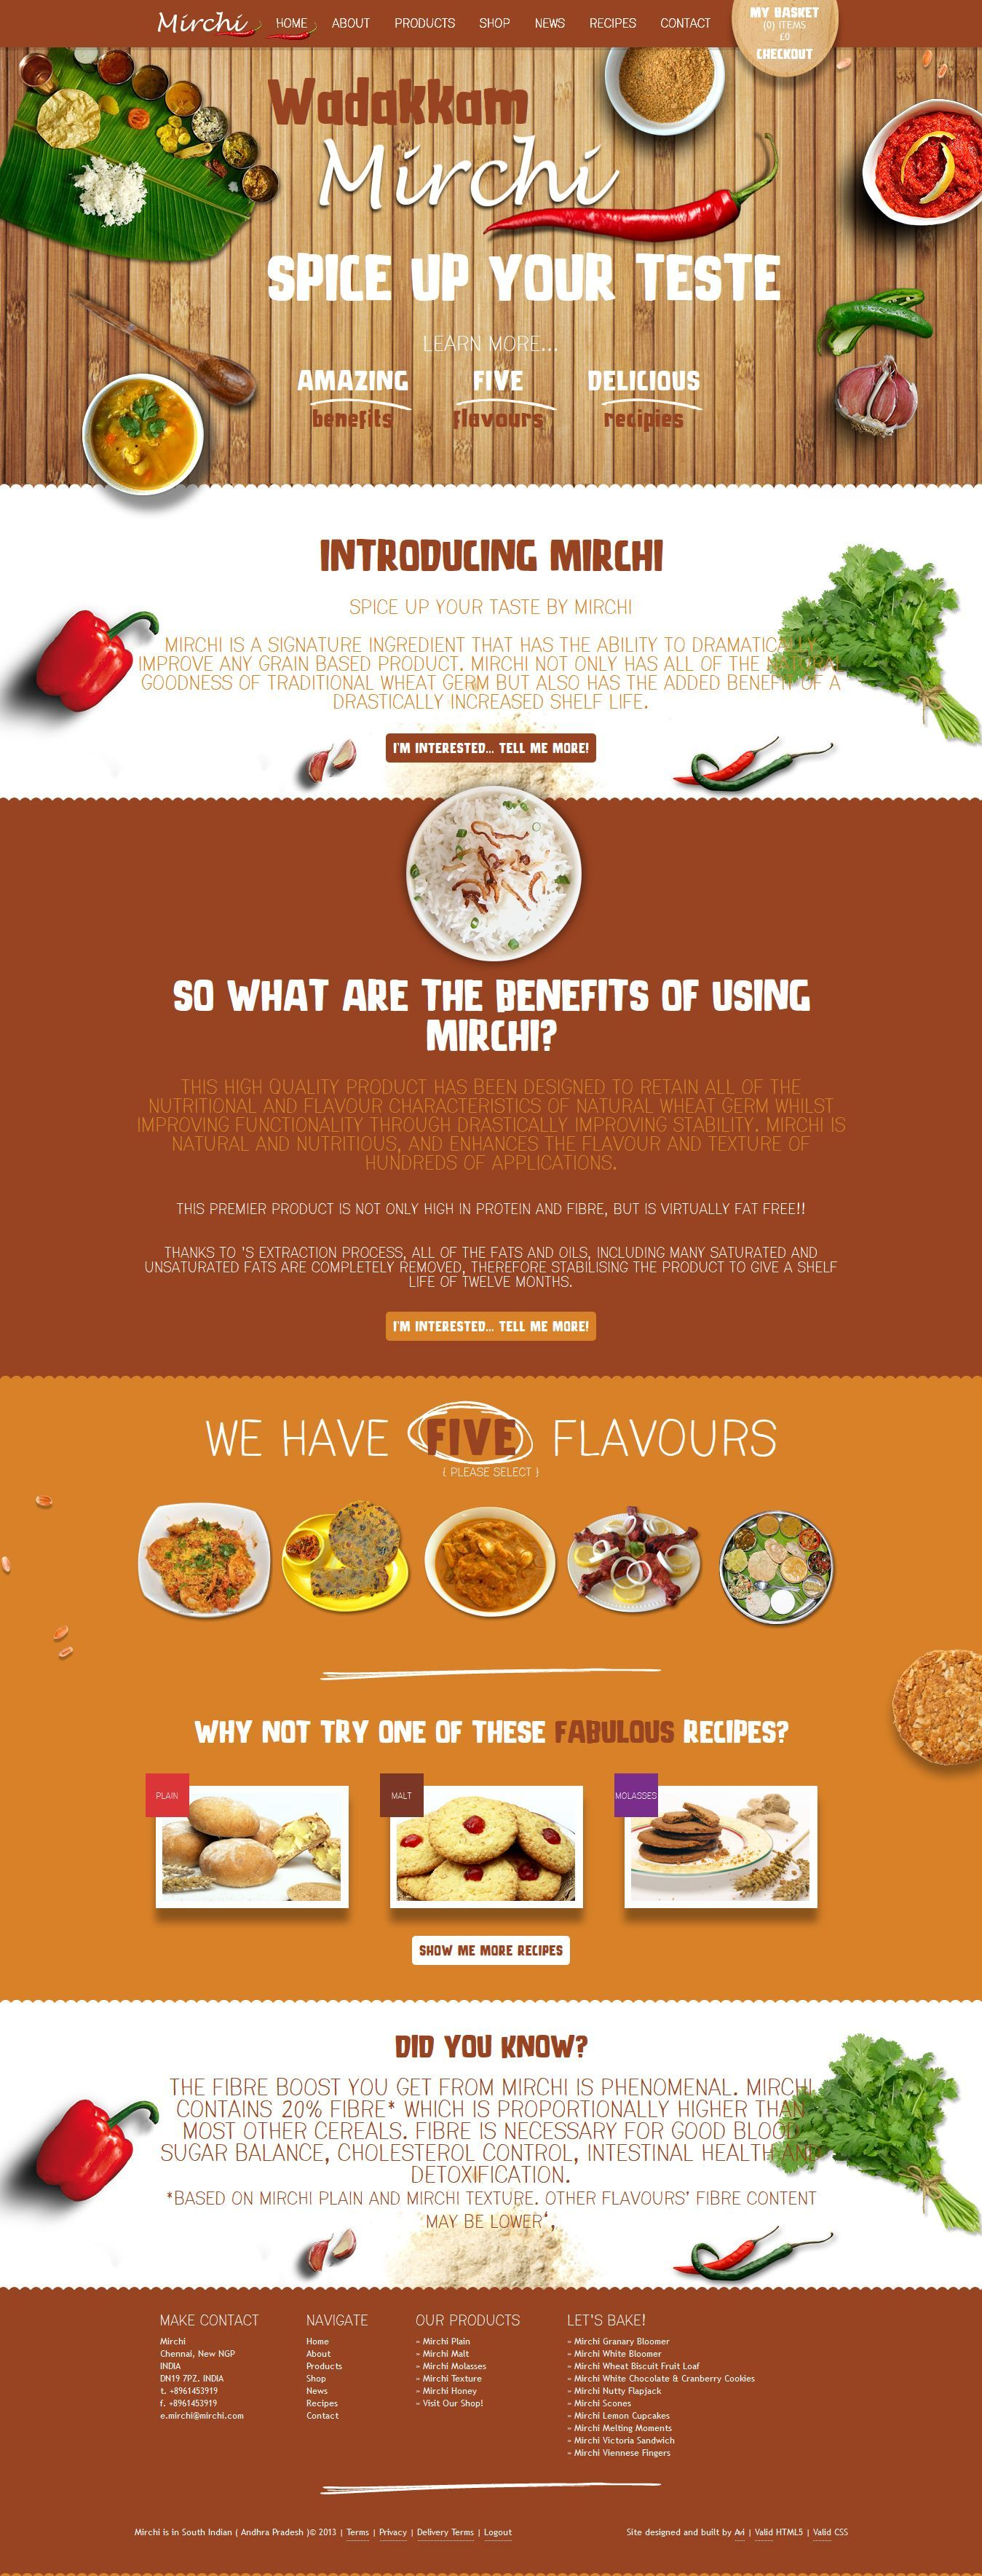 Indian Food Restaurant Site Design Web Layout Design Menu Design Food Design